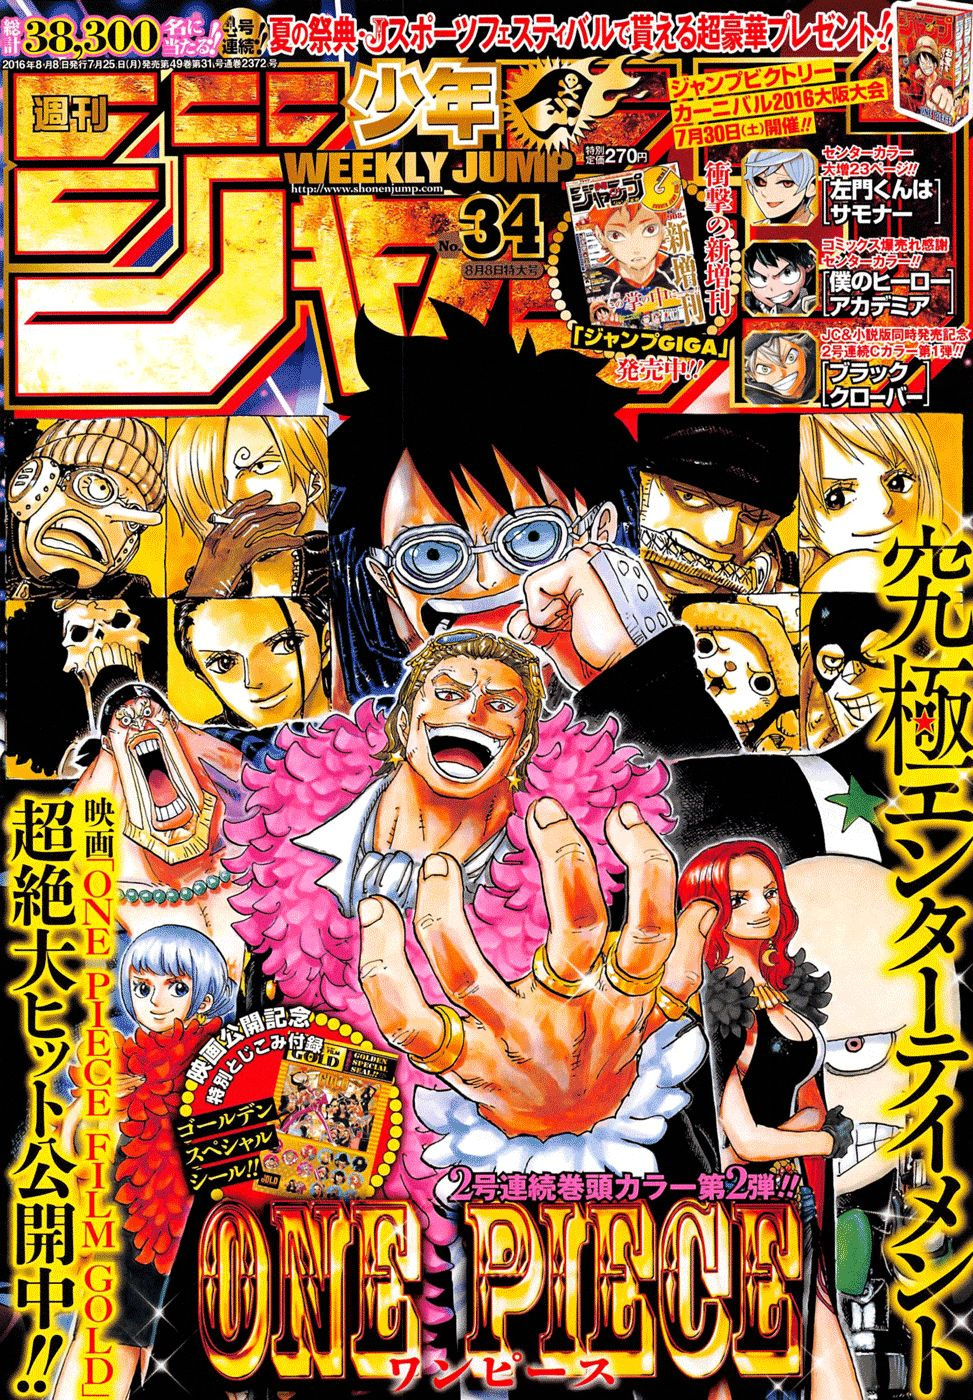 http://c5.ninemanga.com/es_manga/50/114/484783/d3b875cefc3c11eddf86fa9923926b40.jpg Page 2